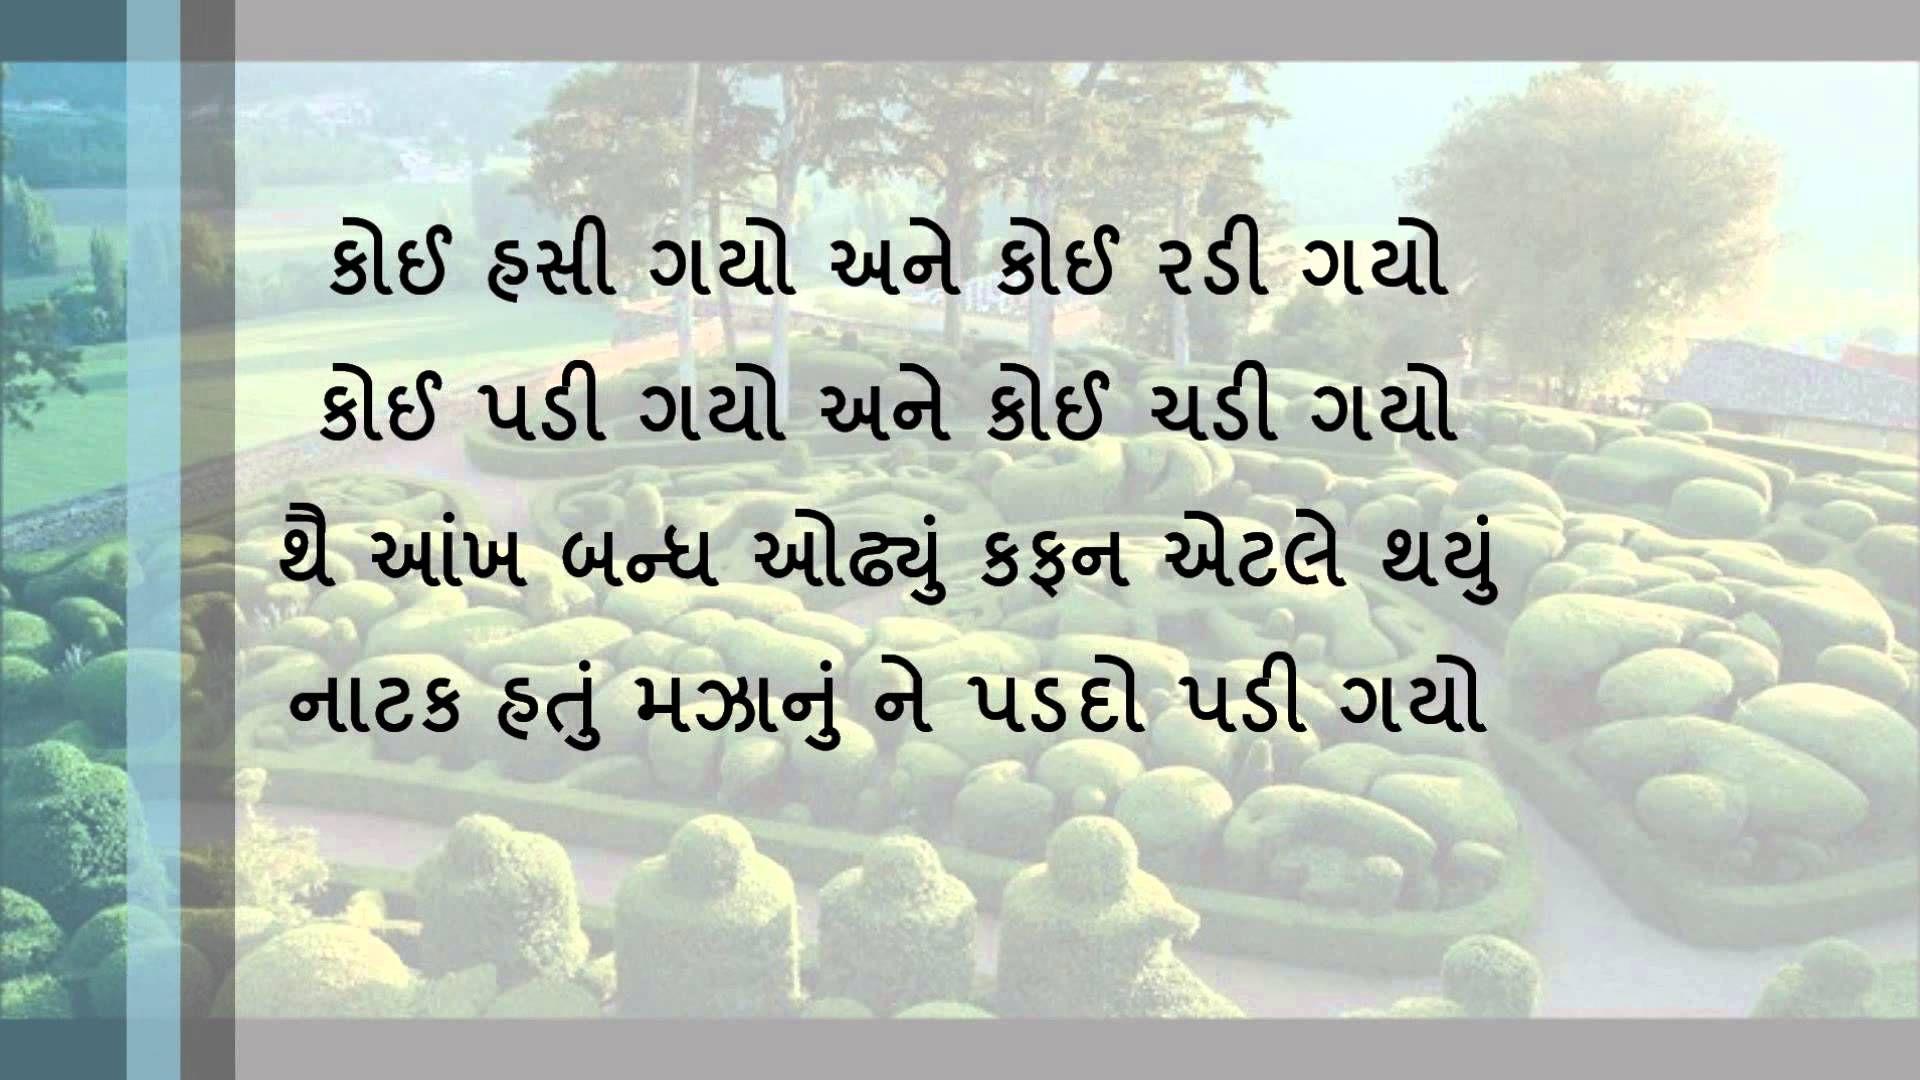 Pin by love patel on gujarati kavita shayari pinterest best gujarati shayari for you altavistaventures Gallery